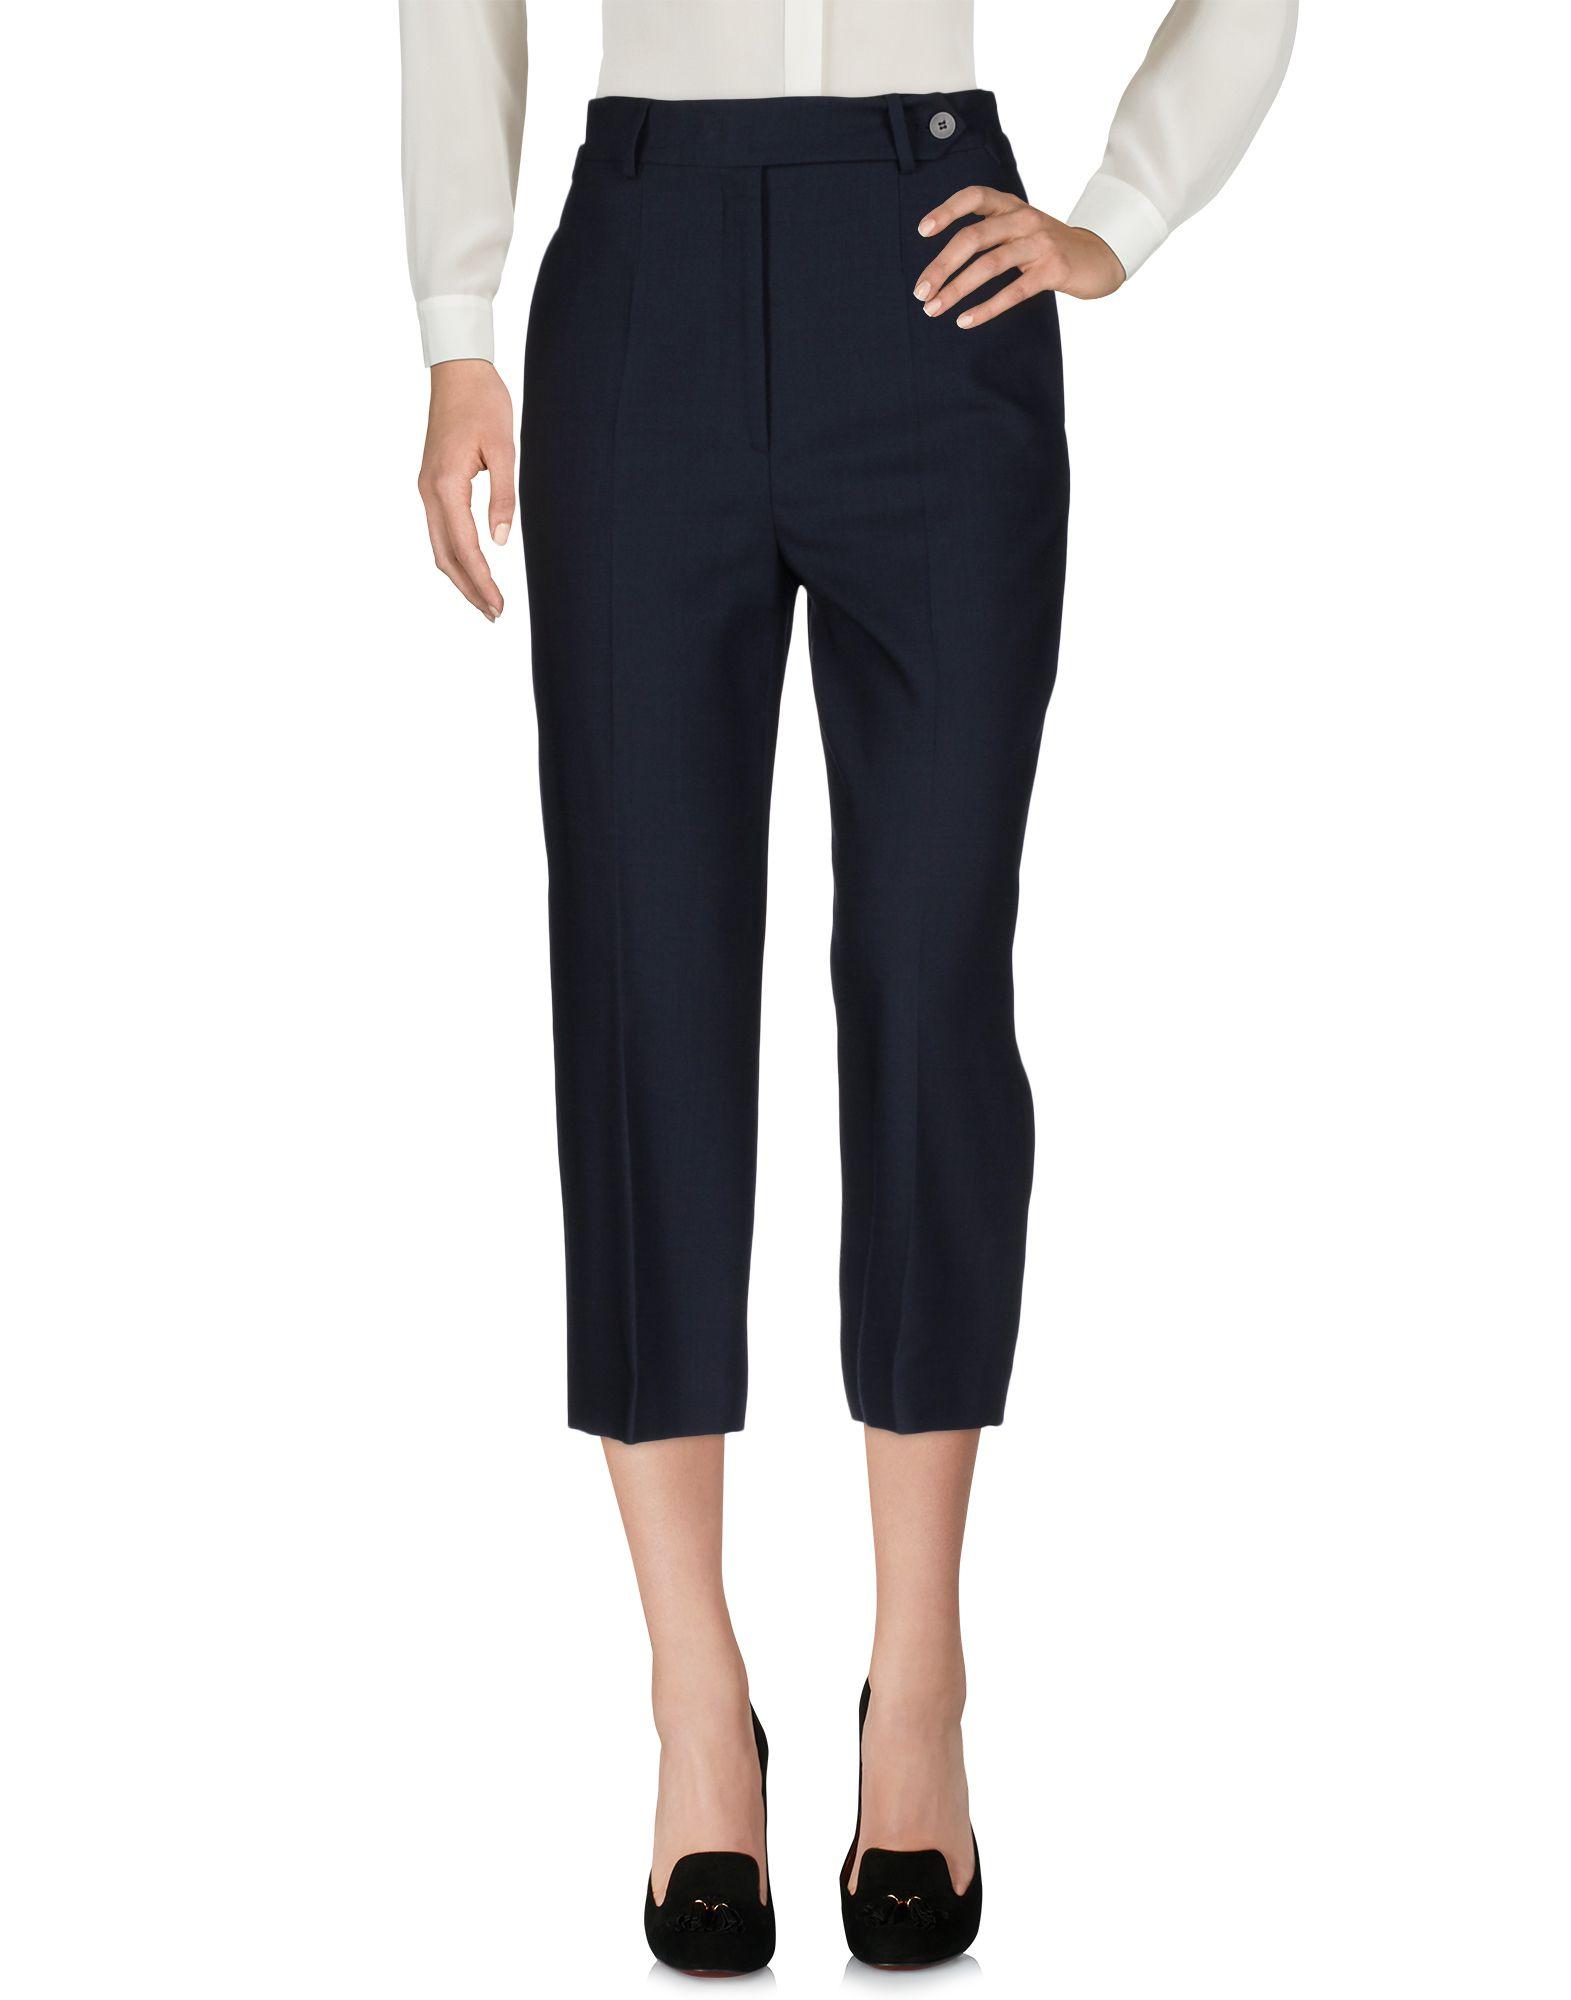 Pantalone rotvalentino damen - 13047959CW